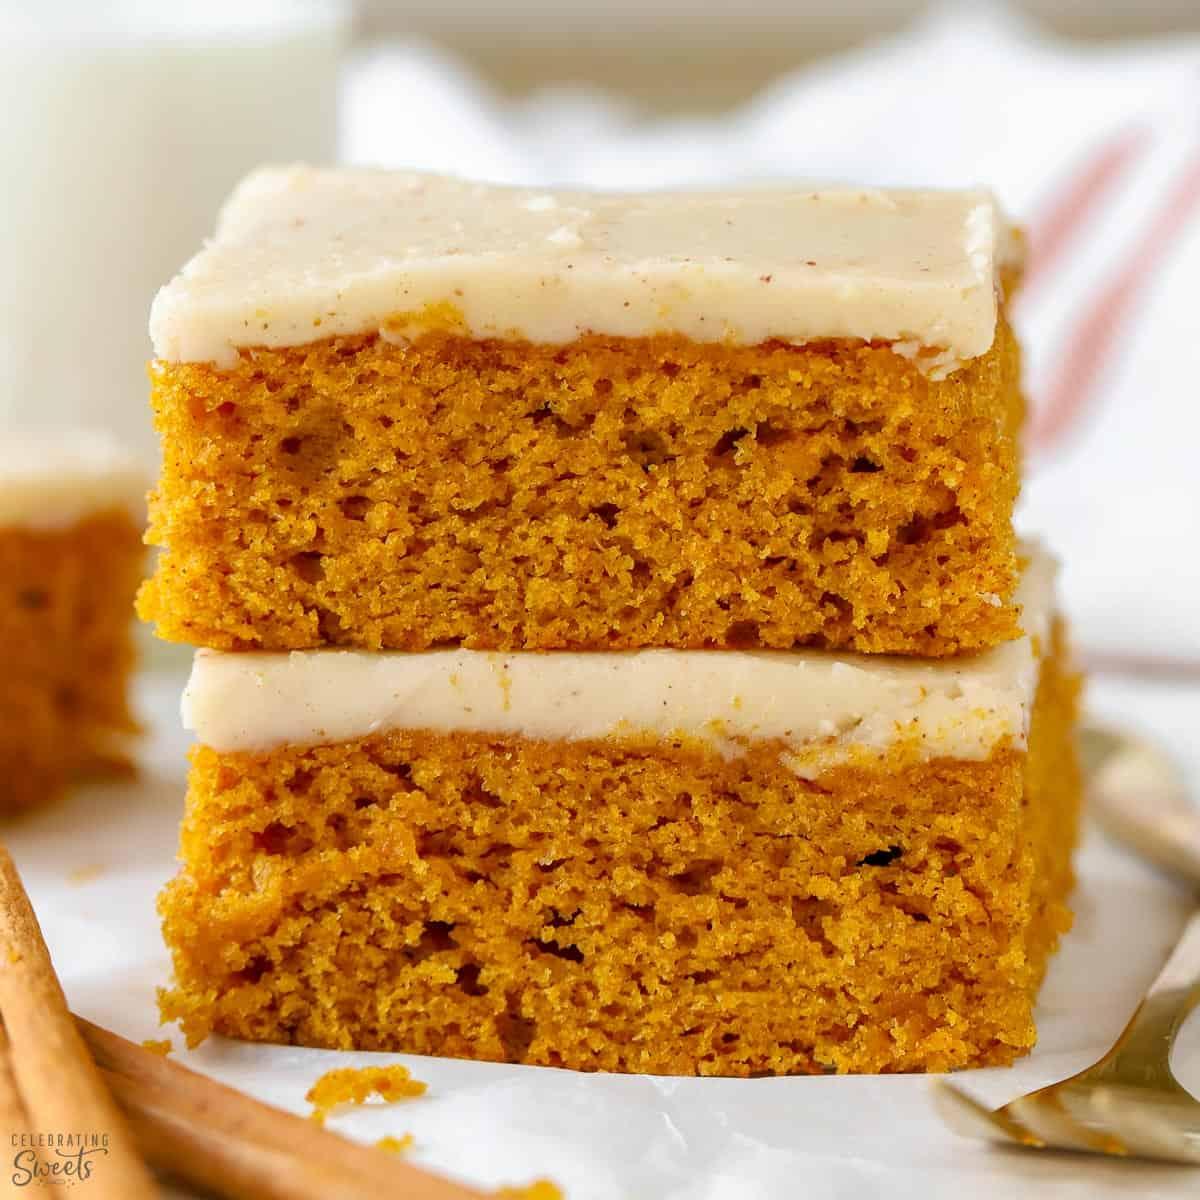 Pumpkin Bars Celebrating Sweets